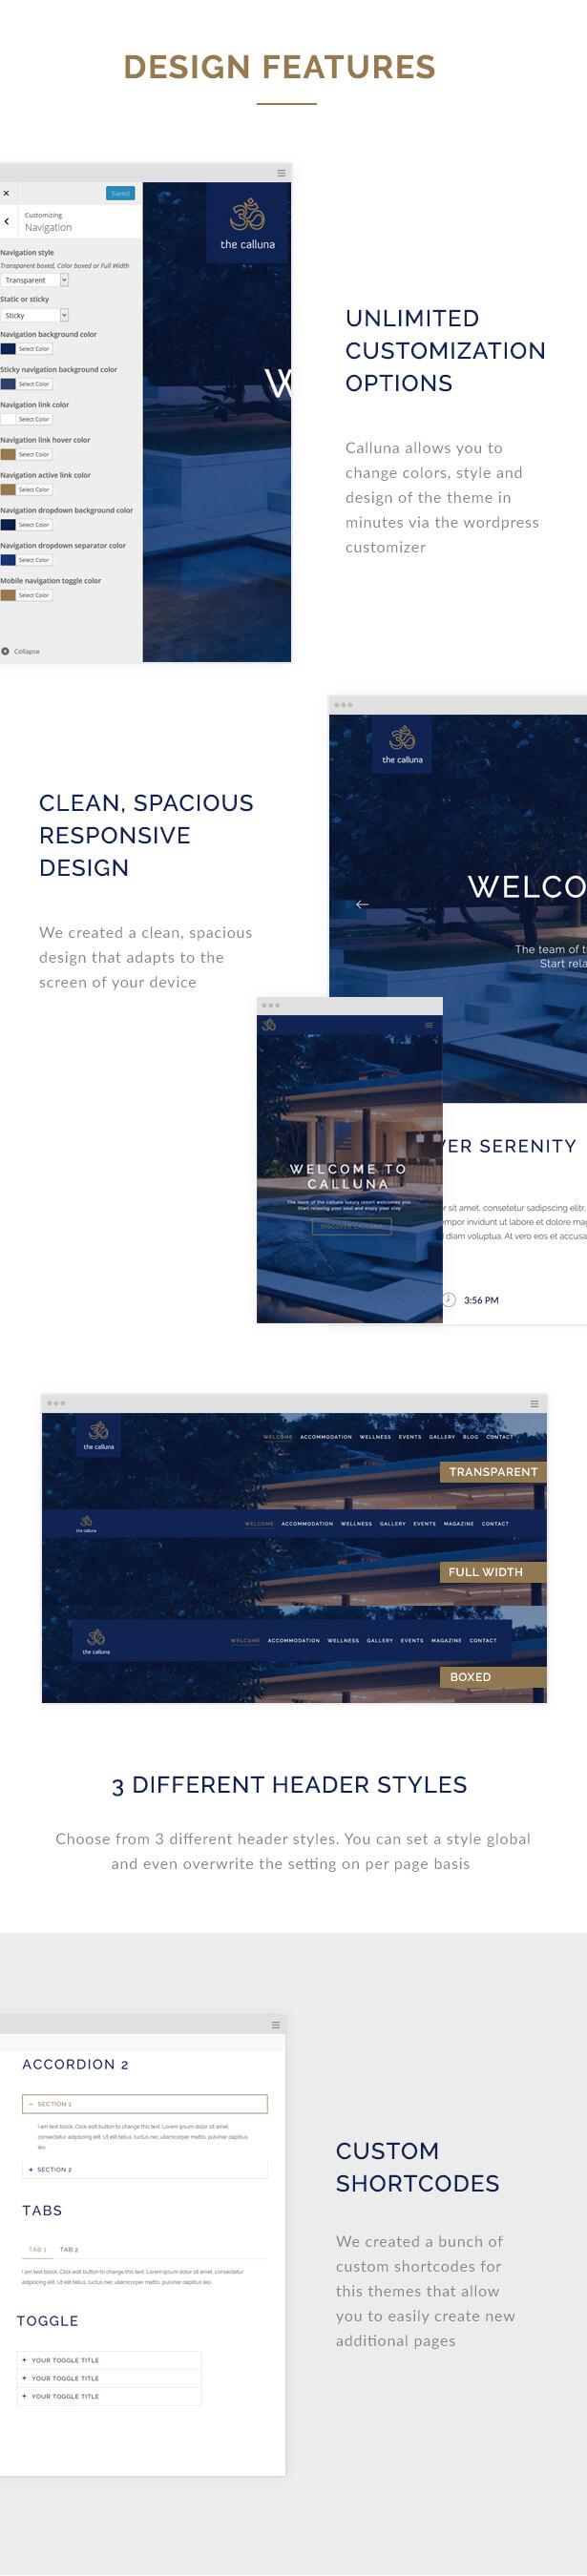 Hotel Calluna - Hotel & Resort & WordPress Theme - 4